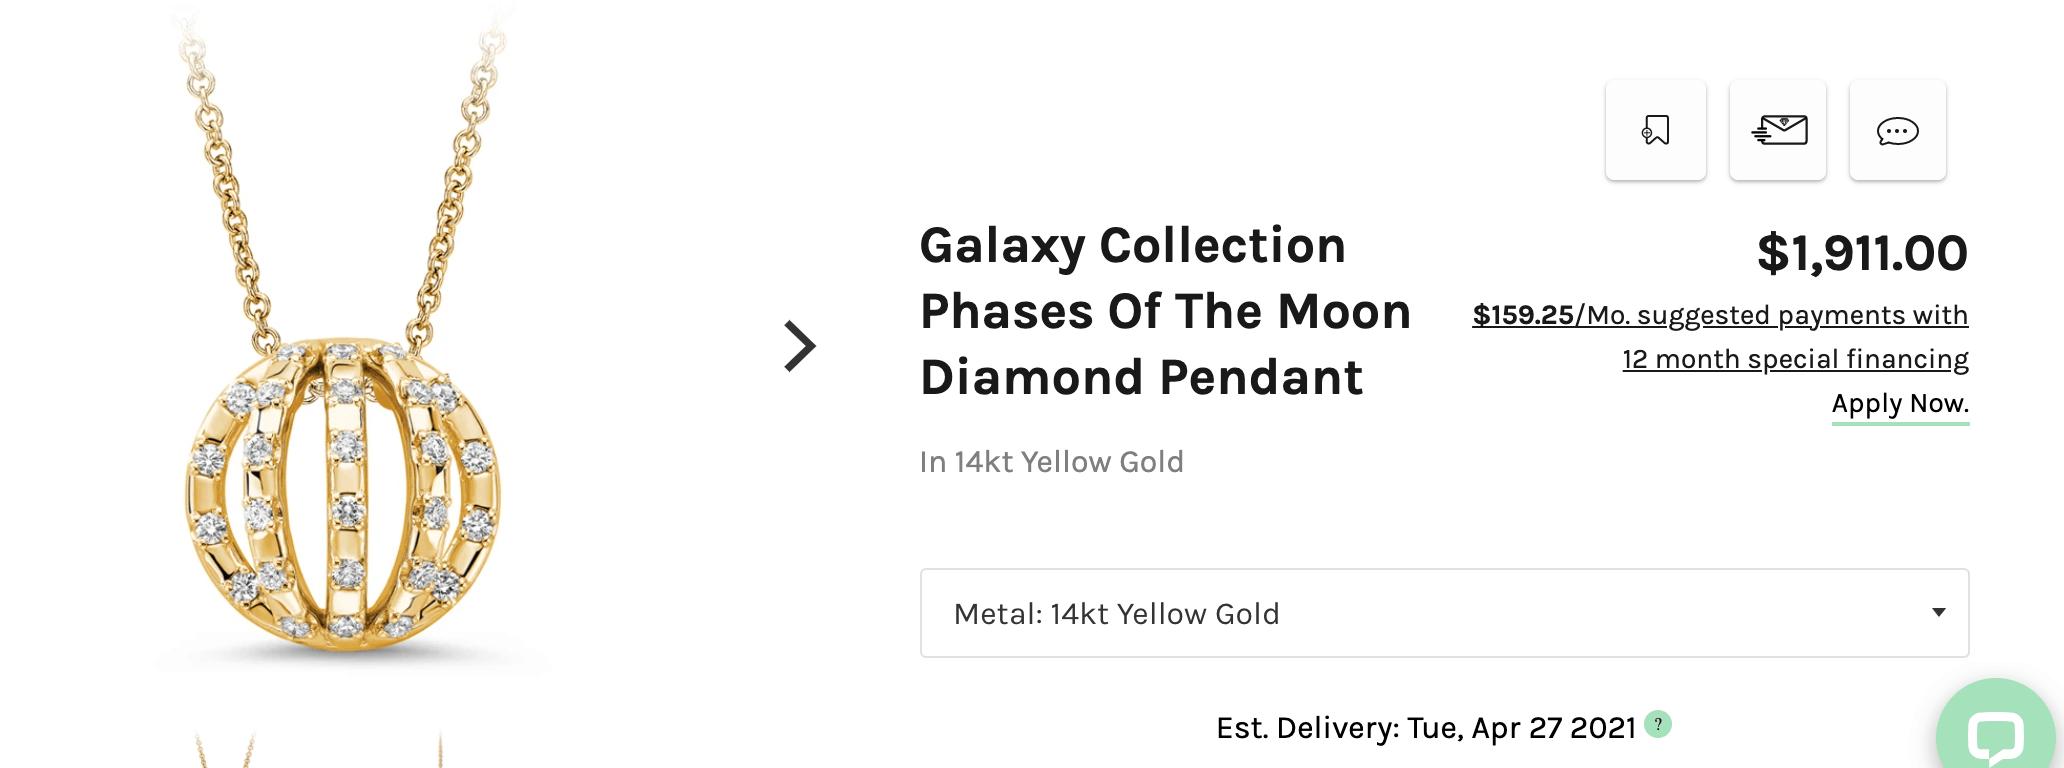 Ritani gold chain with pendant